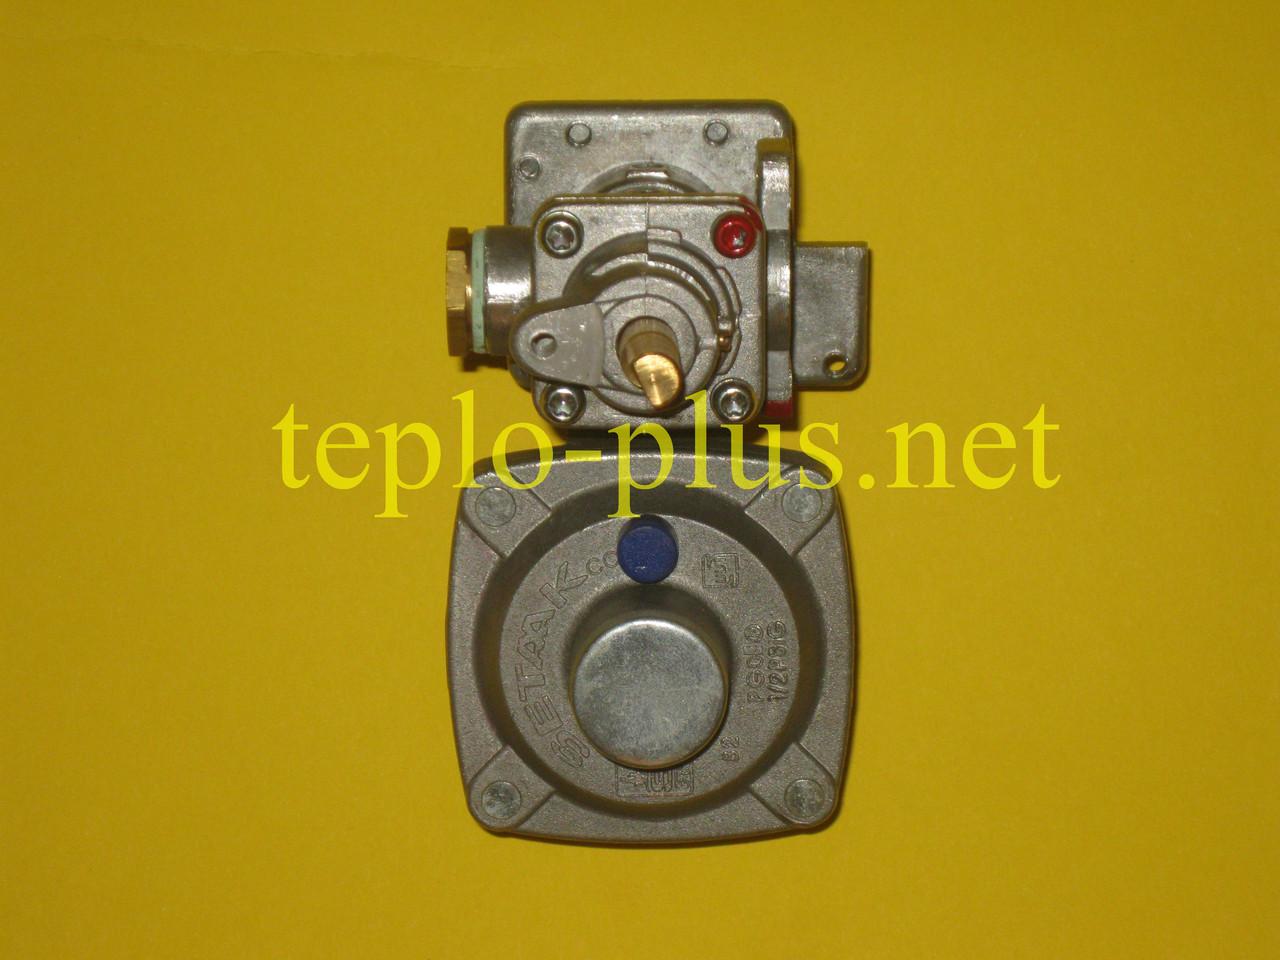 Газовая арматура с регулятором давления в сборе 20044969 Beretta Idrabagno Aqua 11, 14